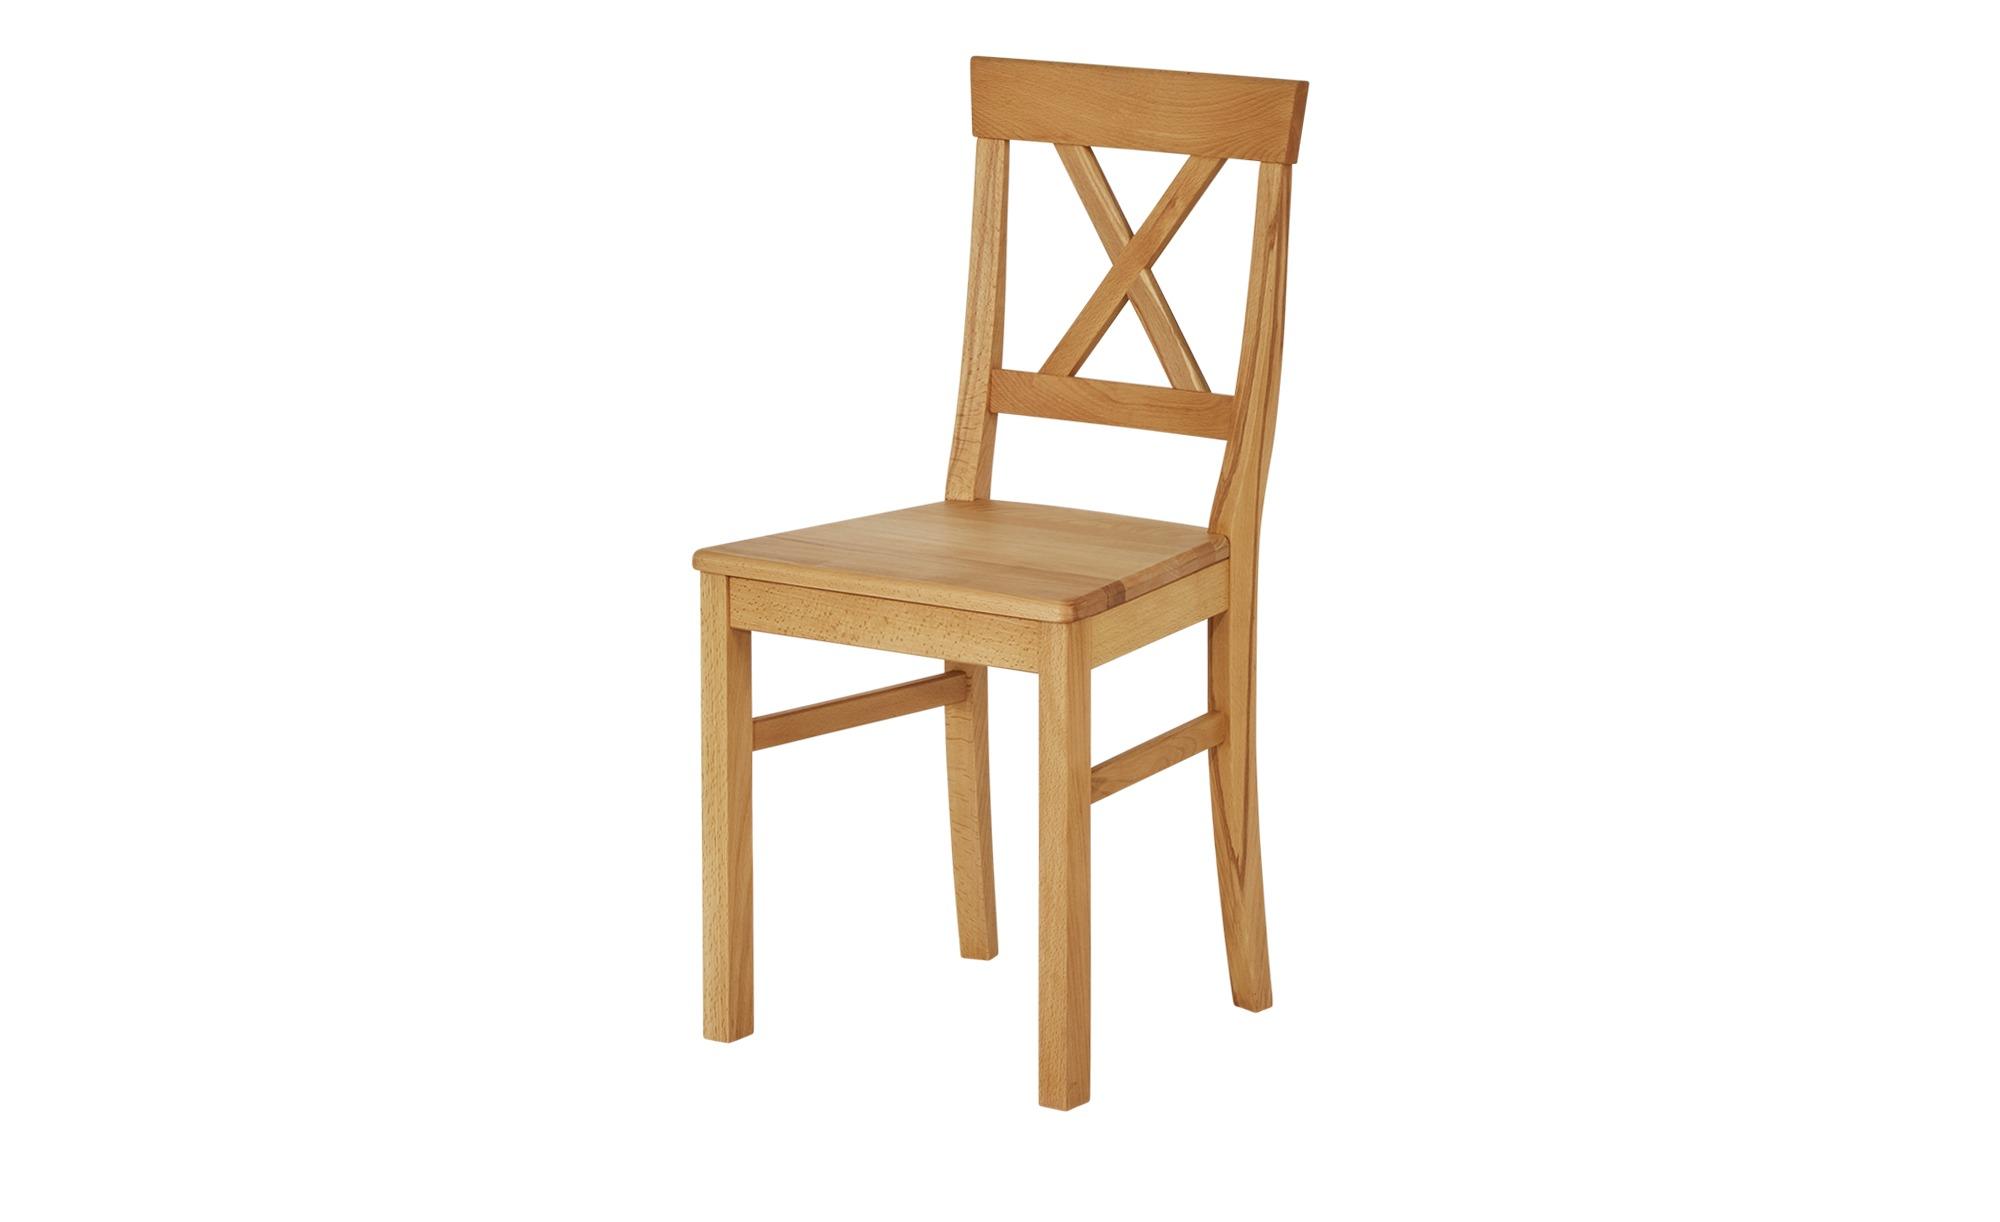 Woodford Stuhl Lukas 44 cm 92 cm 47 cm Stühle > Esszimmerstühle Möbel Kraft